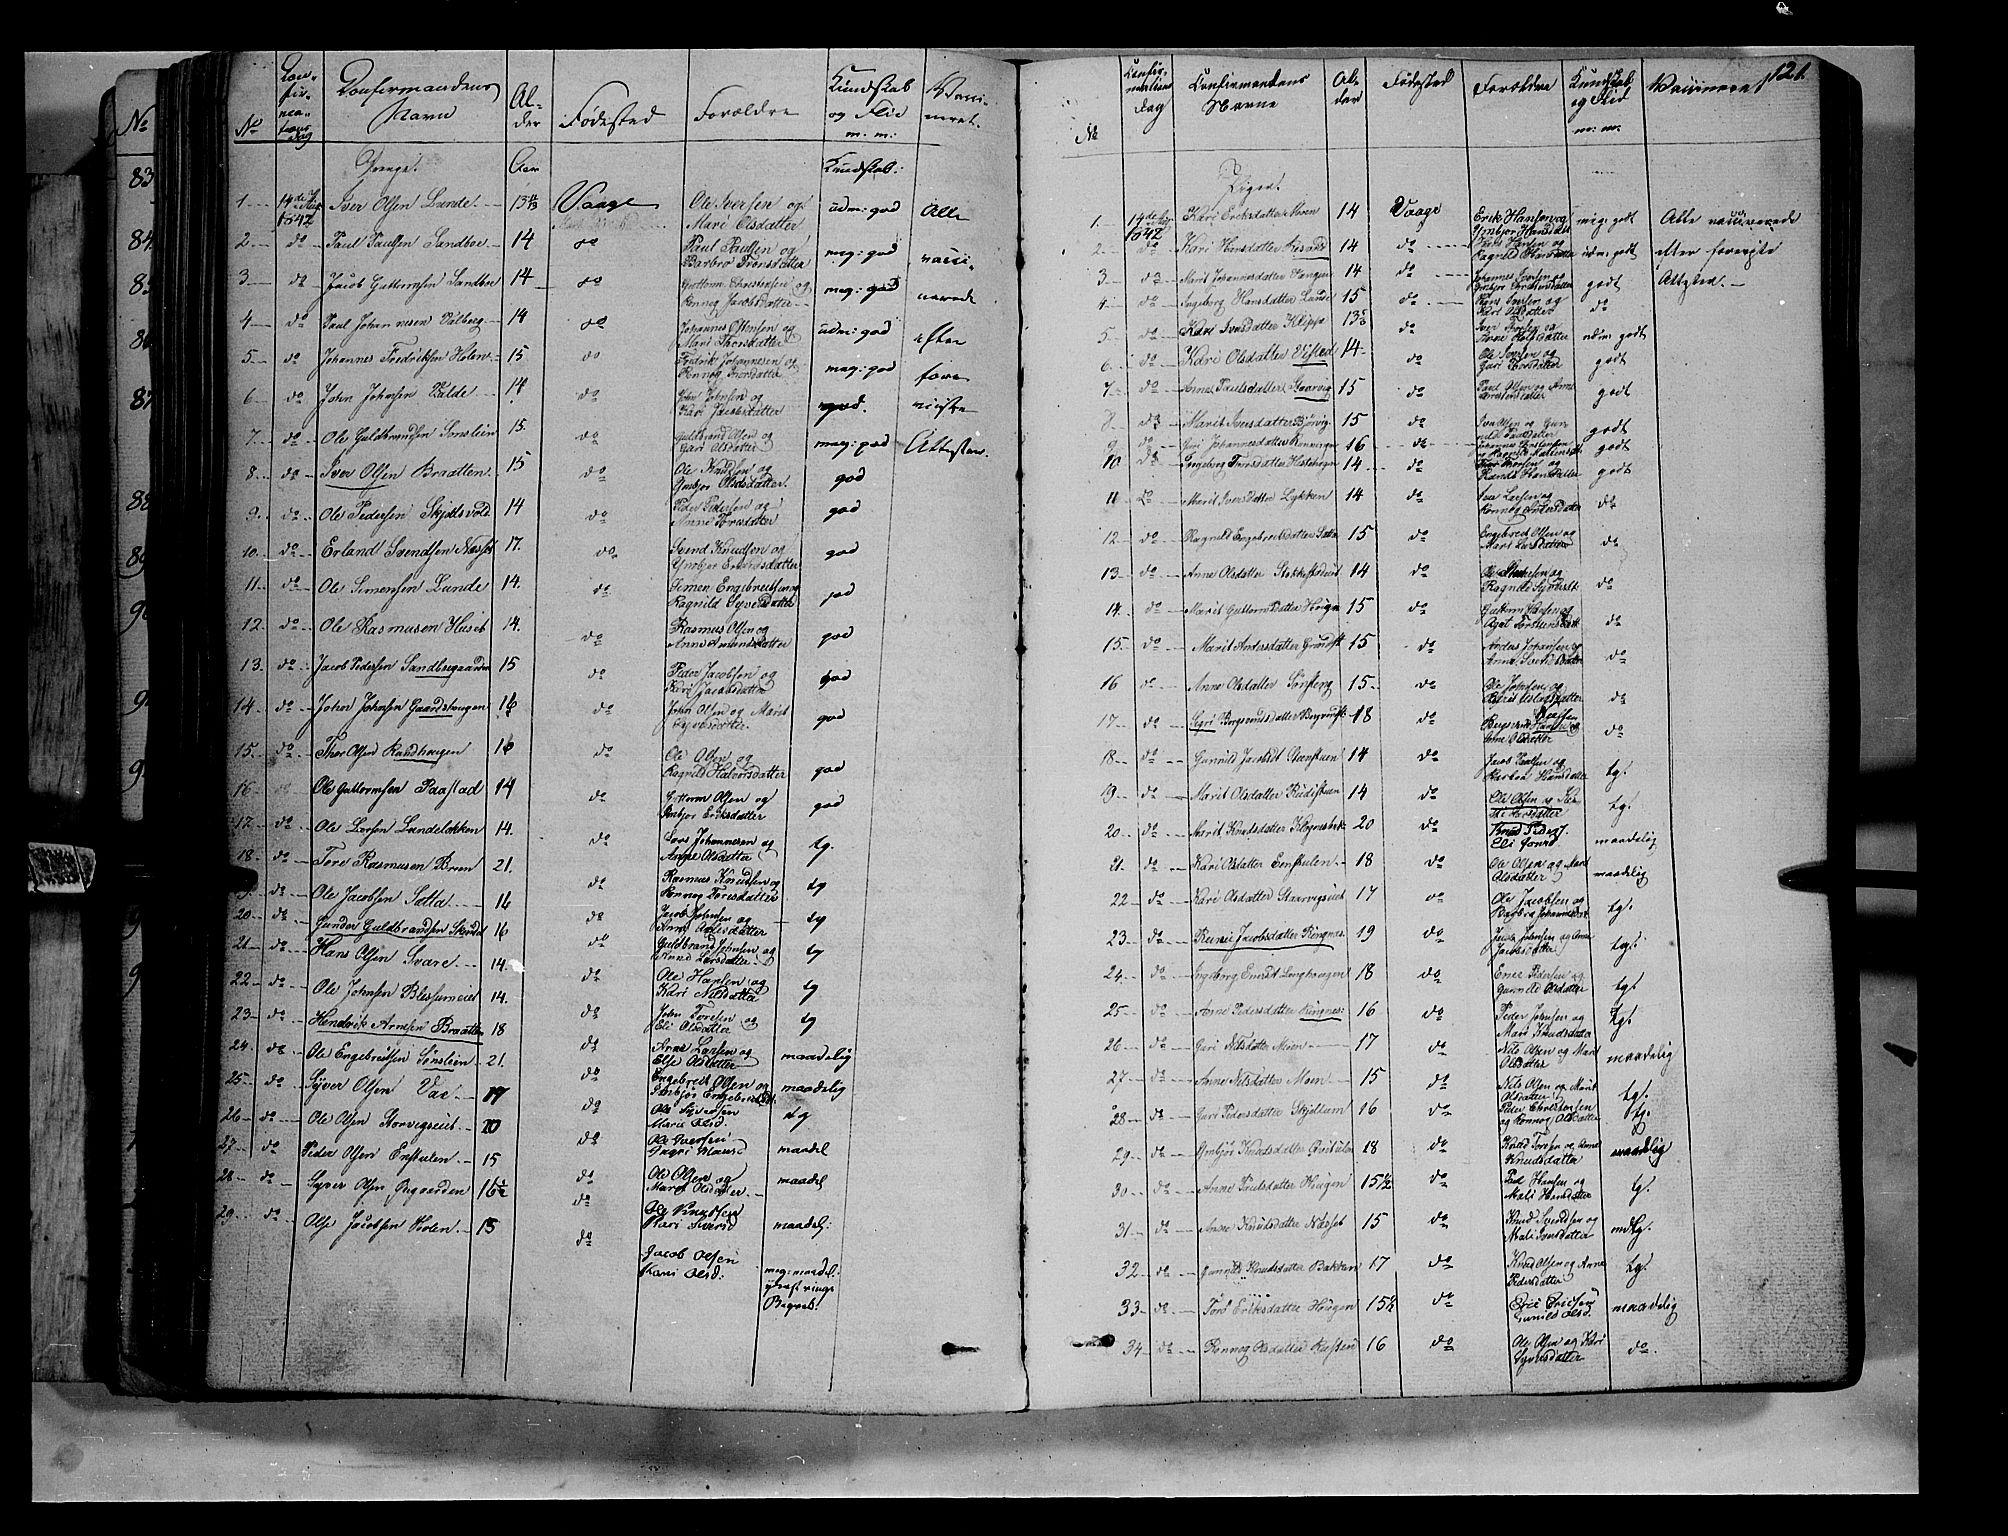 SAH, Vågå prestekontor, Ministerialbok nr. 5 /1, 1842-1856, s. 121